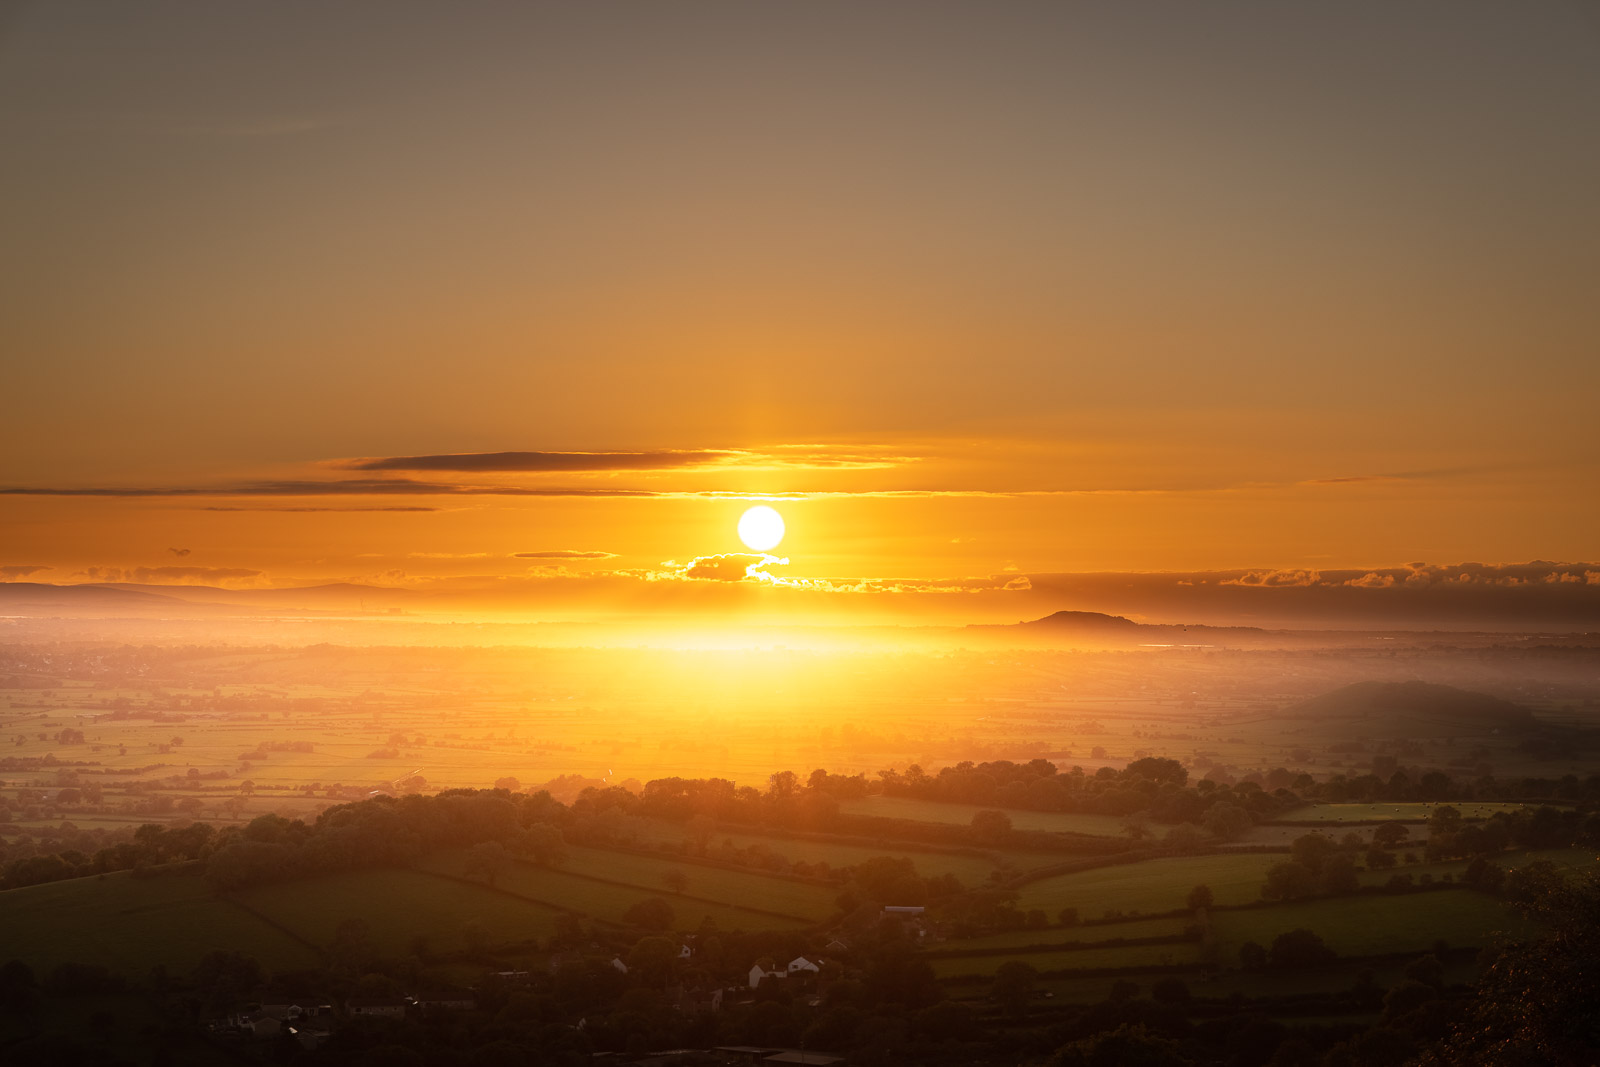 Autumn Equinox - Lynchcombe, Mendip Hills, Somerset, UK. ID BR57470